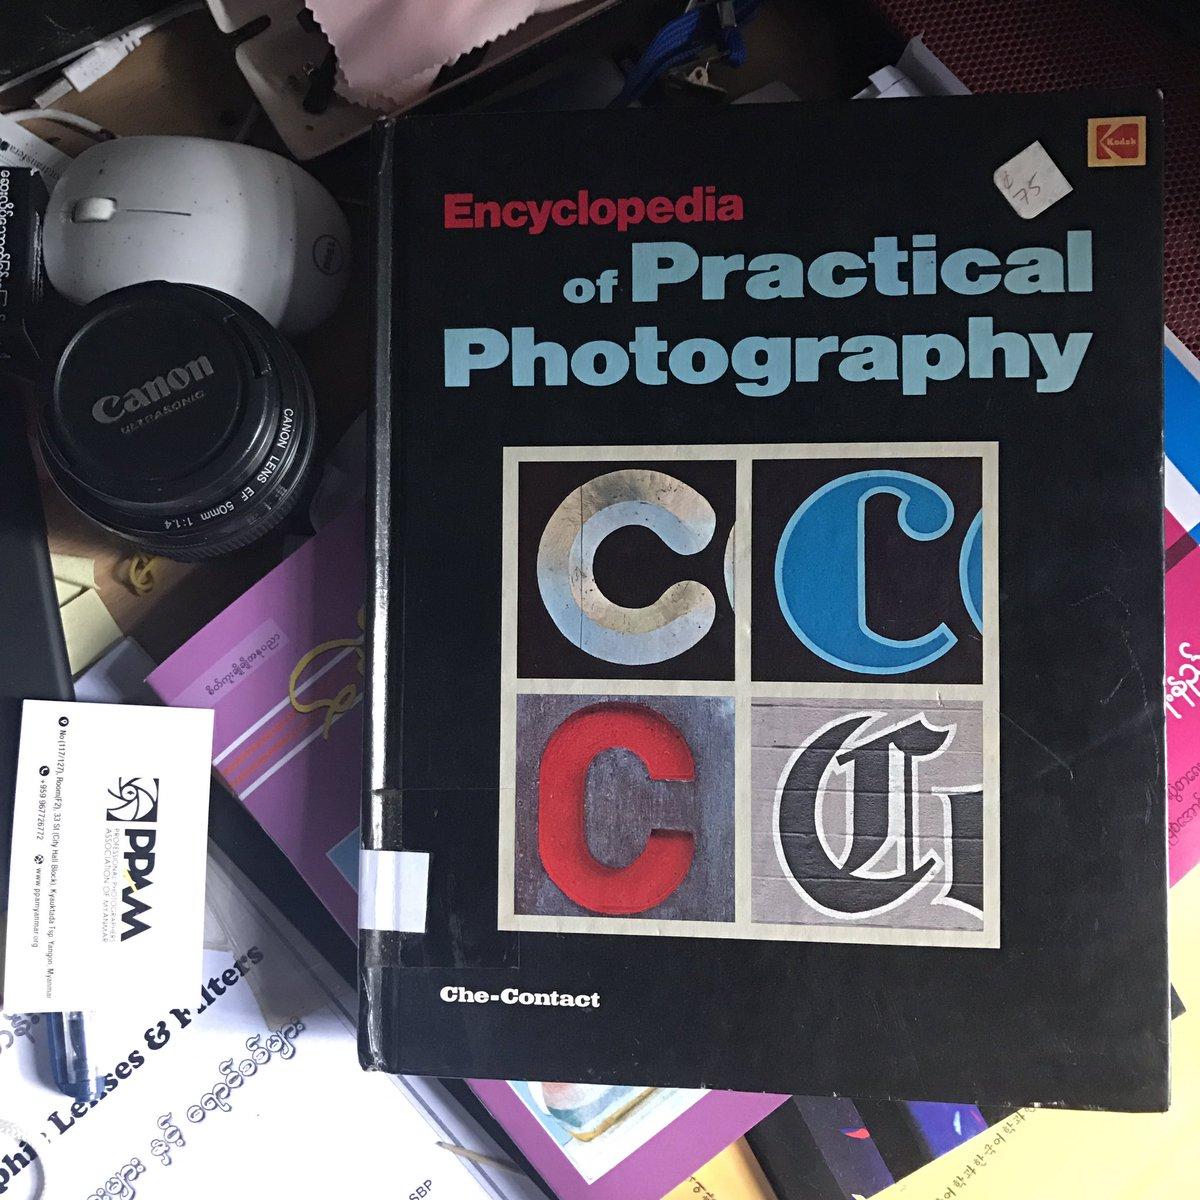 #study #photography#PhotoOfTheDay #follo4folloback #FolloMe #Myanmar #yangon #dyl <br>http://pic.twitter.com/ergtwSTti0